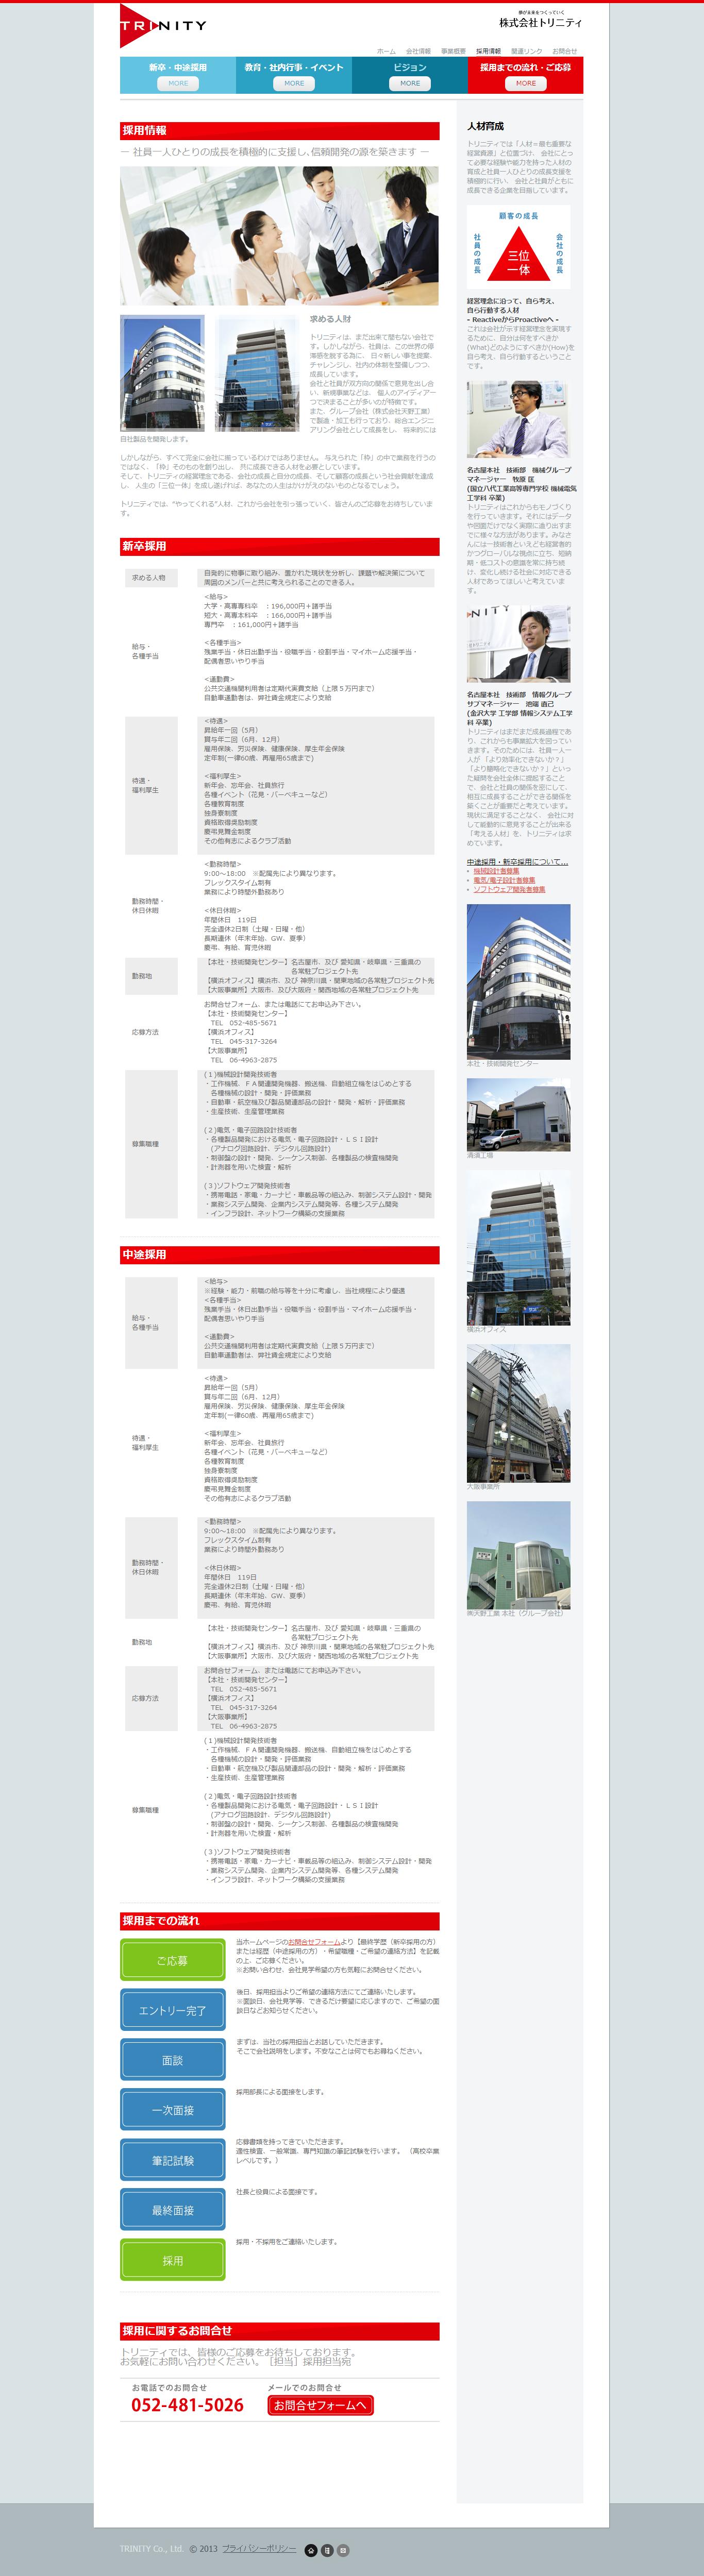 screencapture-trinitas-co-jp-career-html-1456187799019